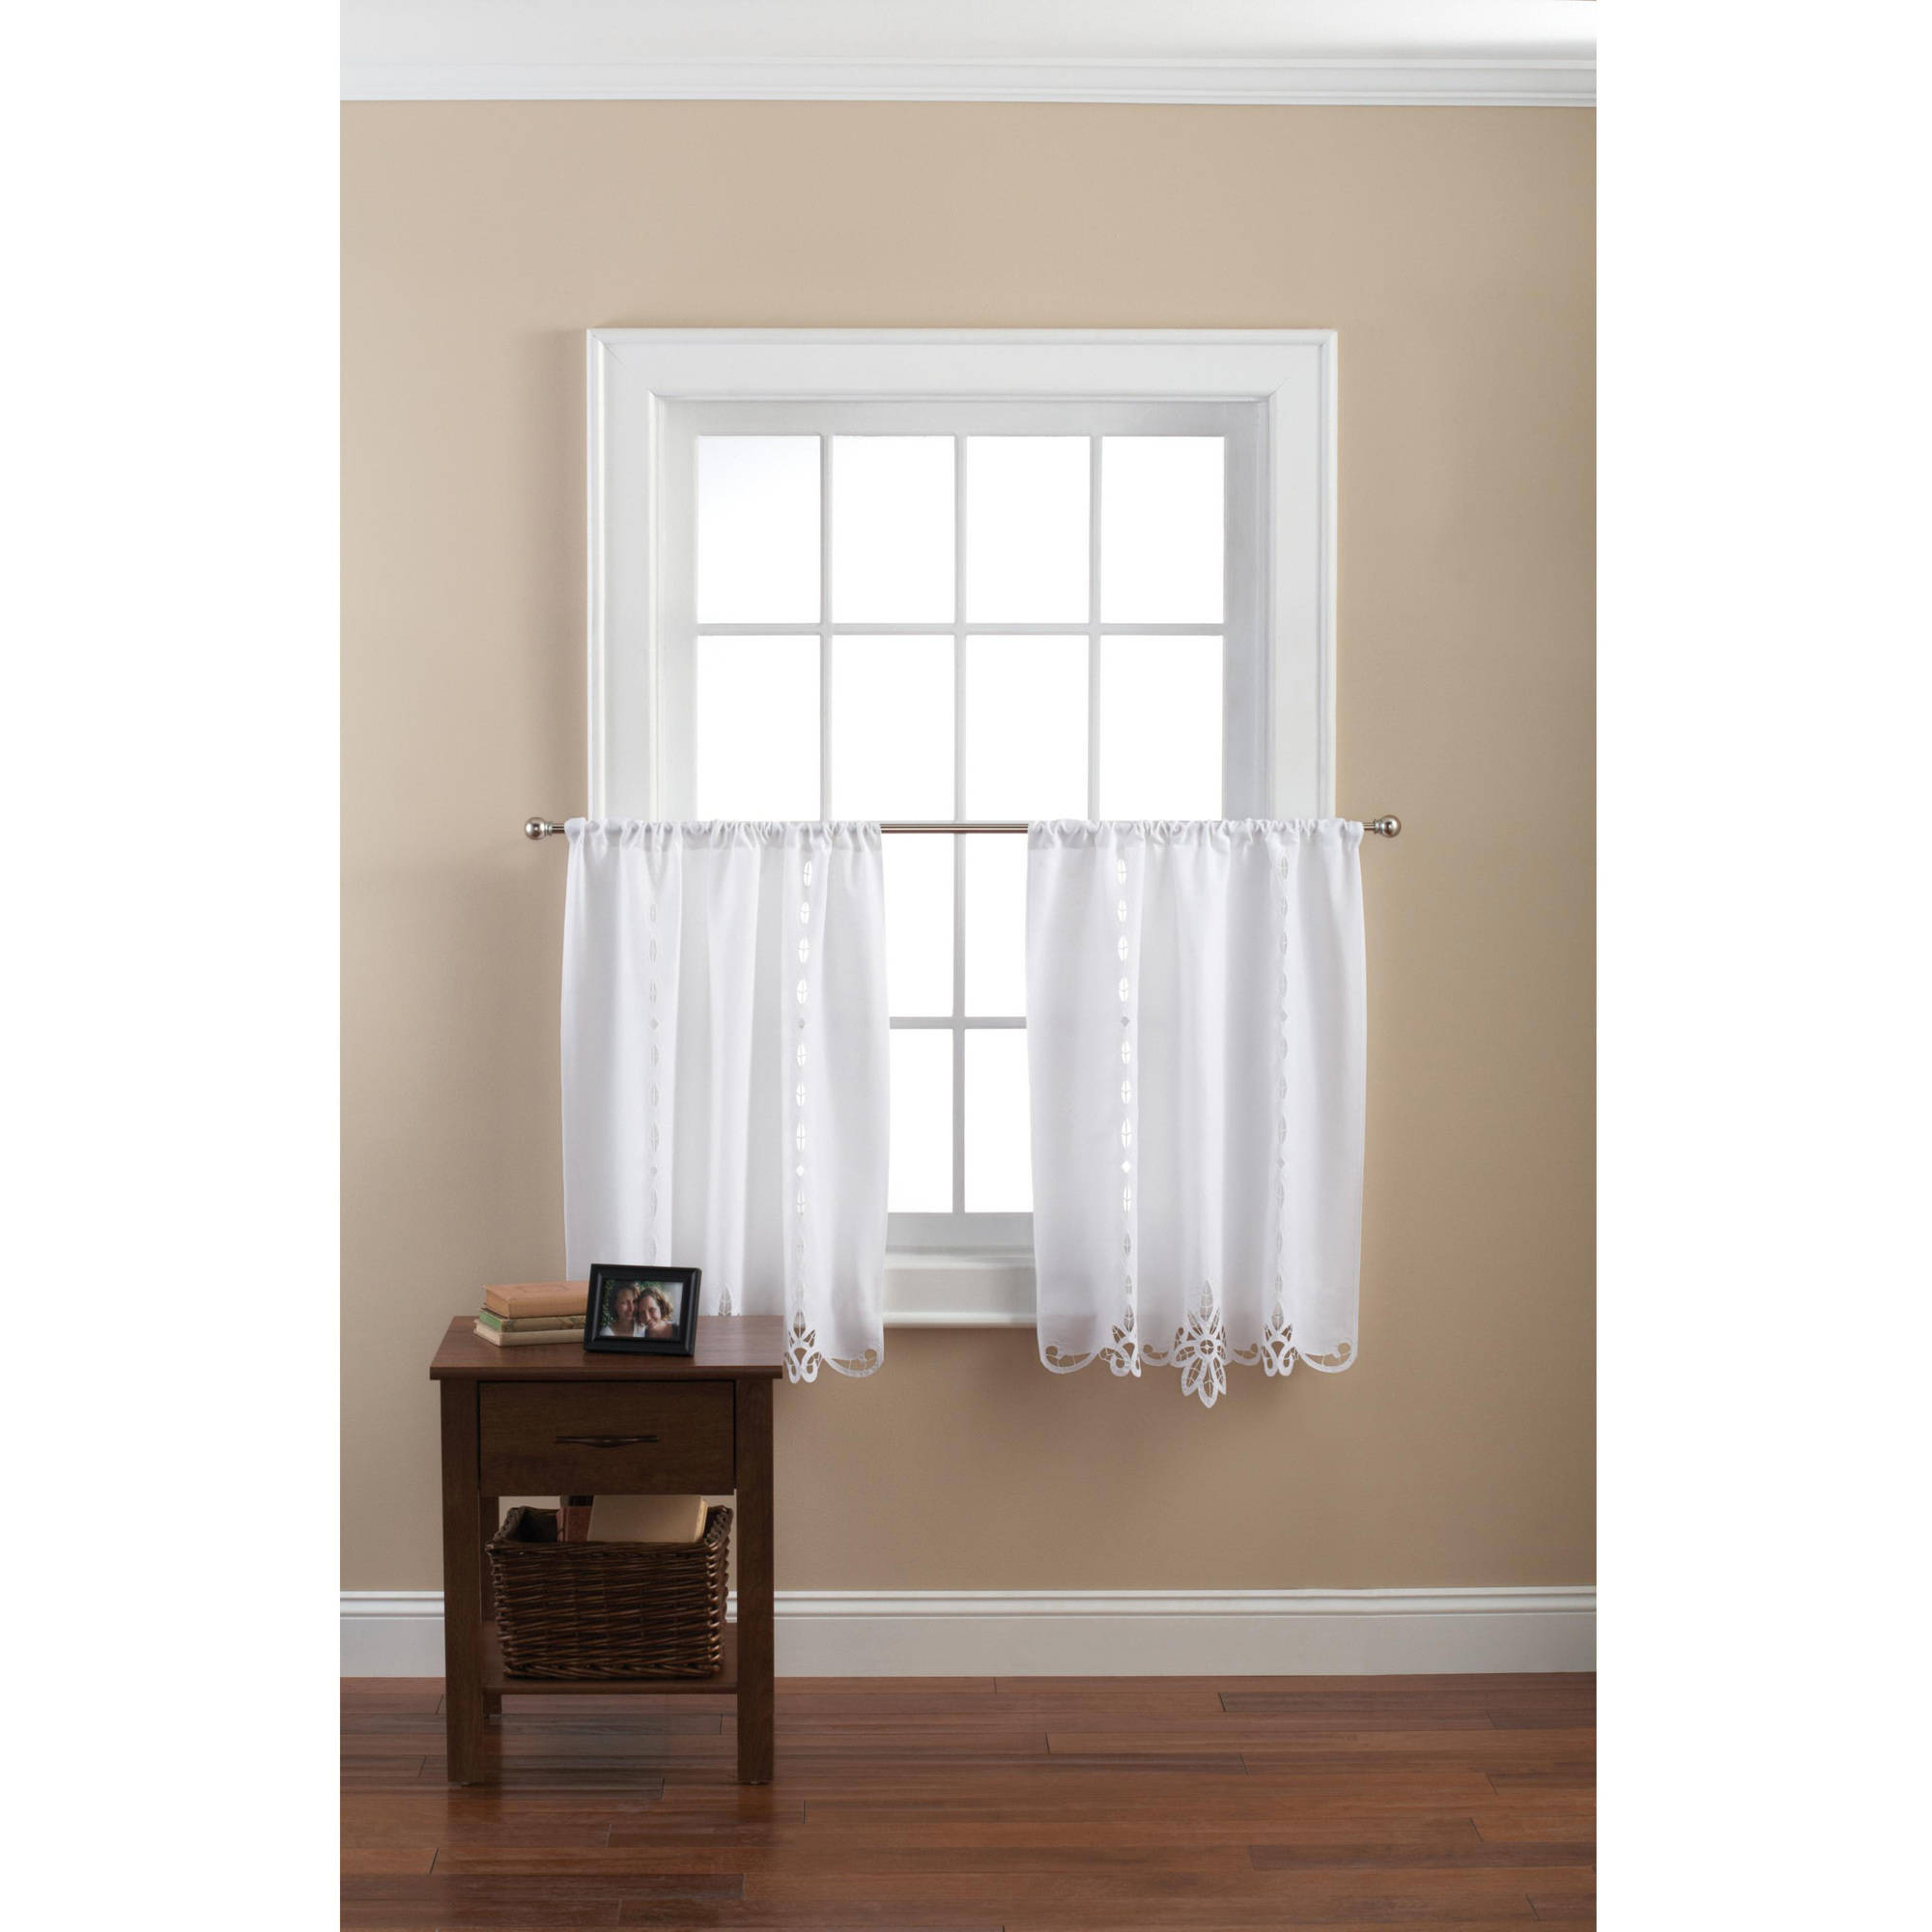 Mainstays Battenburg White Lace Kitchen Curtains, Set Of 2 – Walmart With Regard To Cotton Blend Grey Kitchen Curtain Tiers (View 14 of 20)